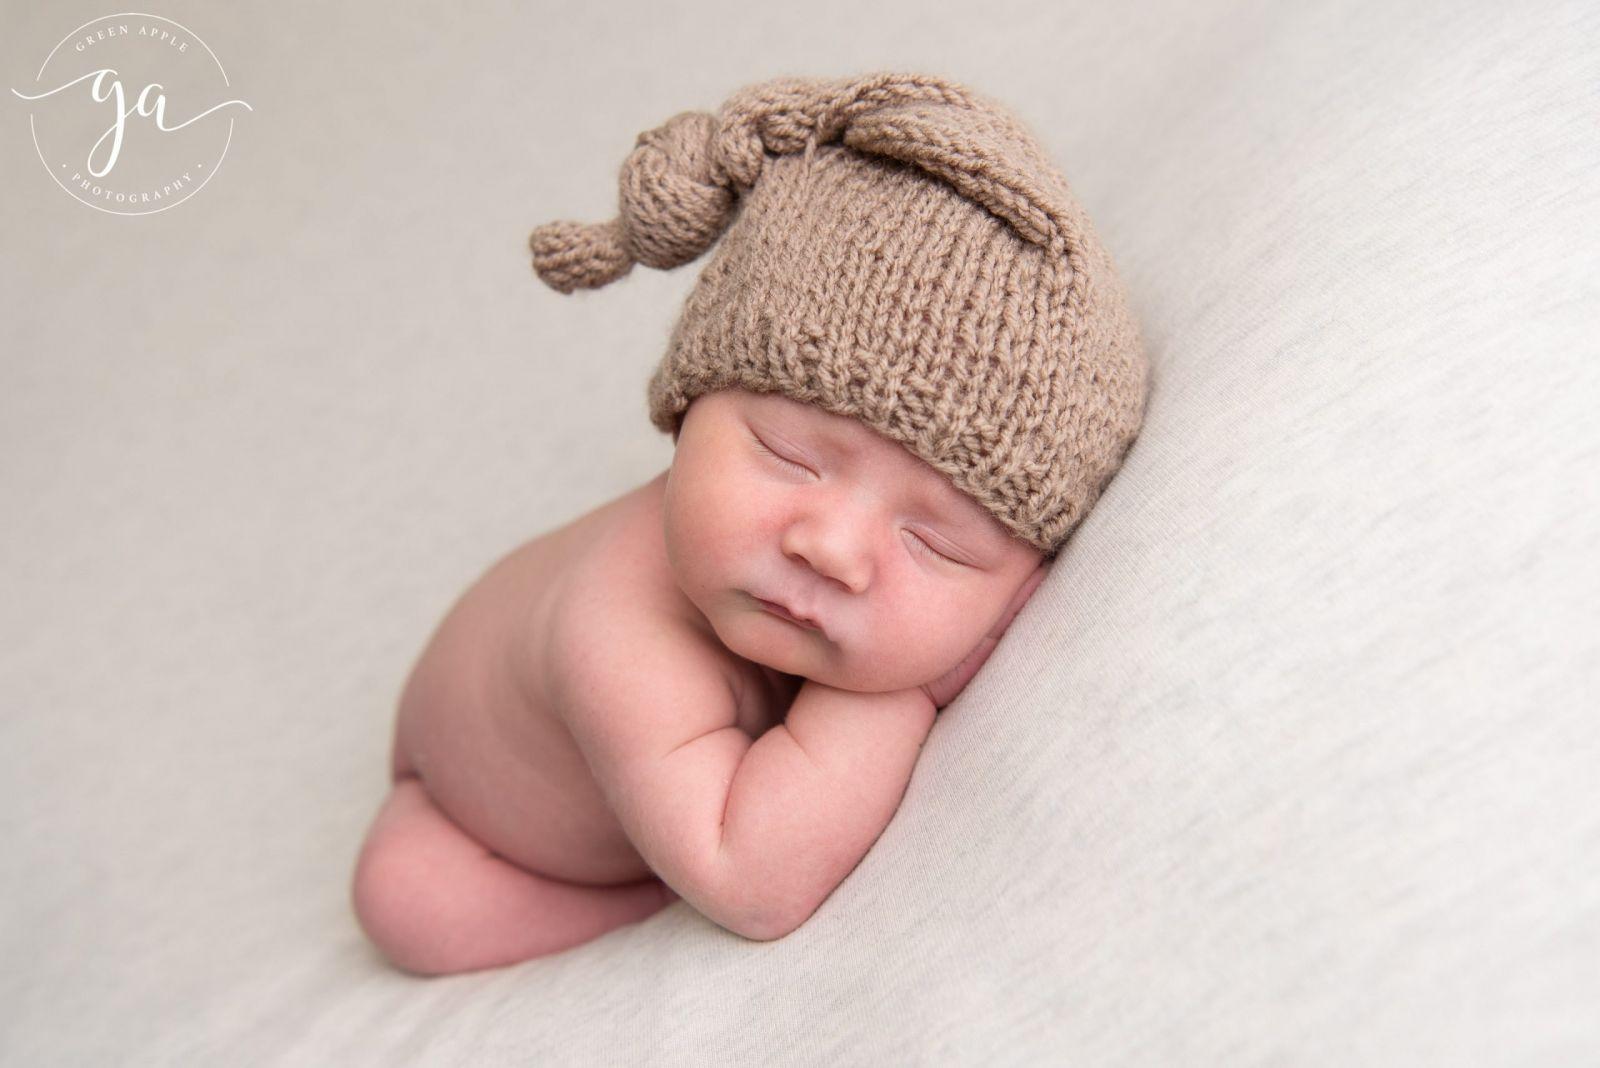 sleeping newborn boy with brown knitted hat